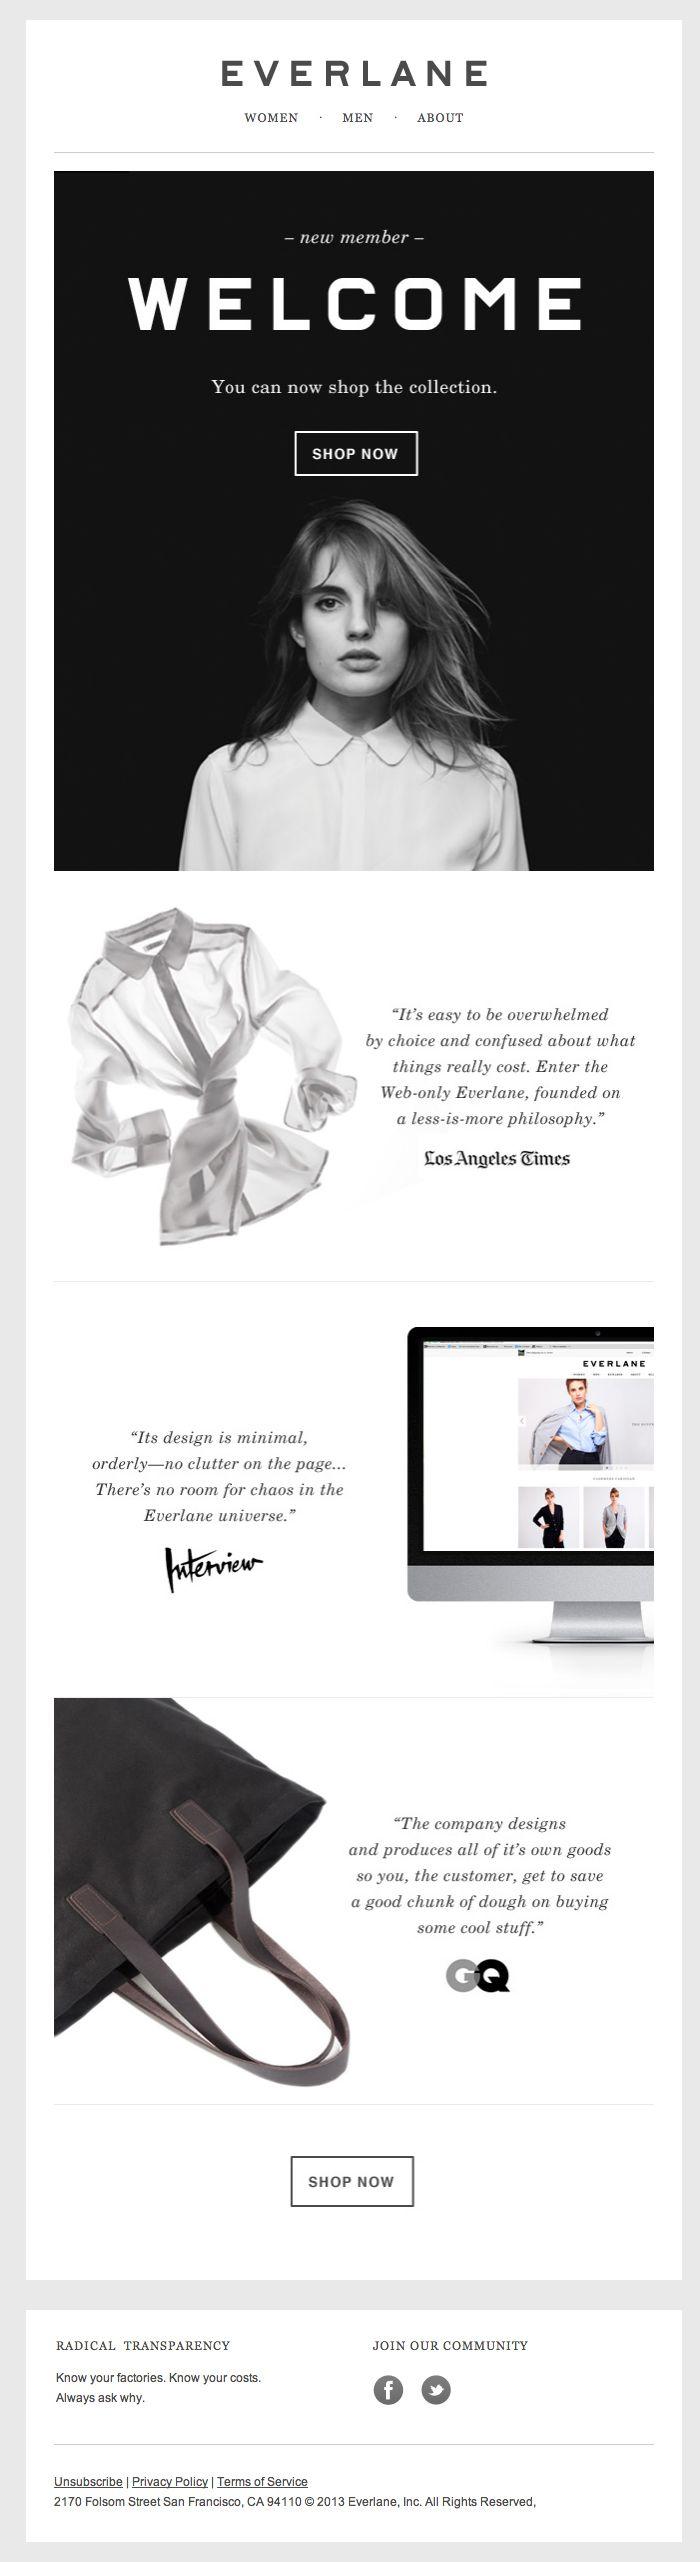 Welcome to Everlane #newsletter #enewsletter #emaildesign #emailmarketing